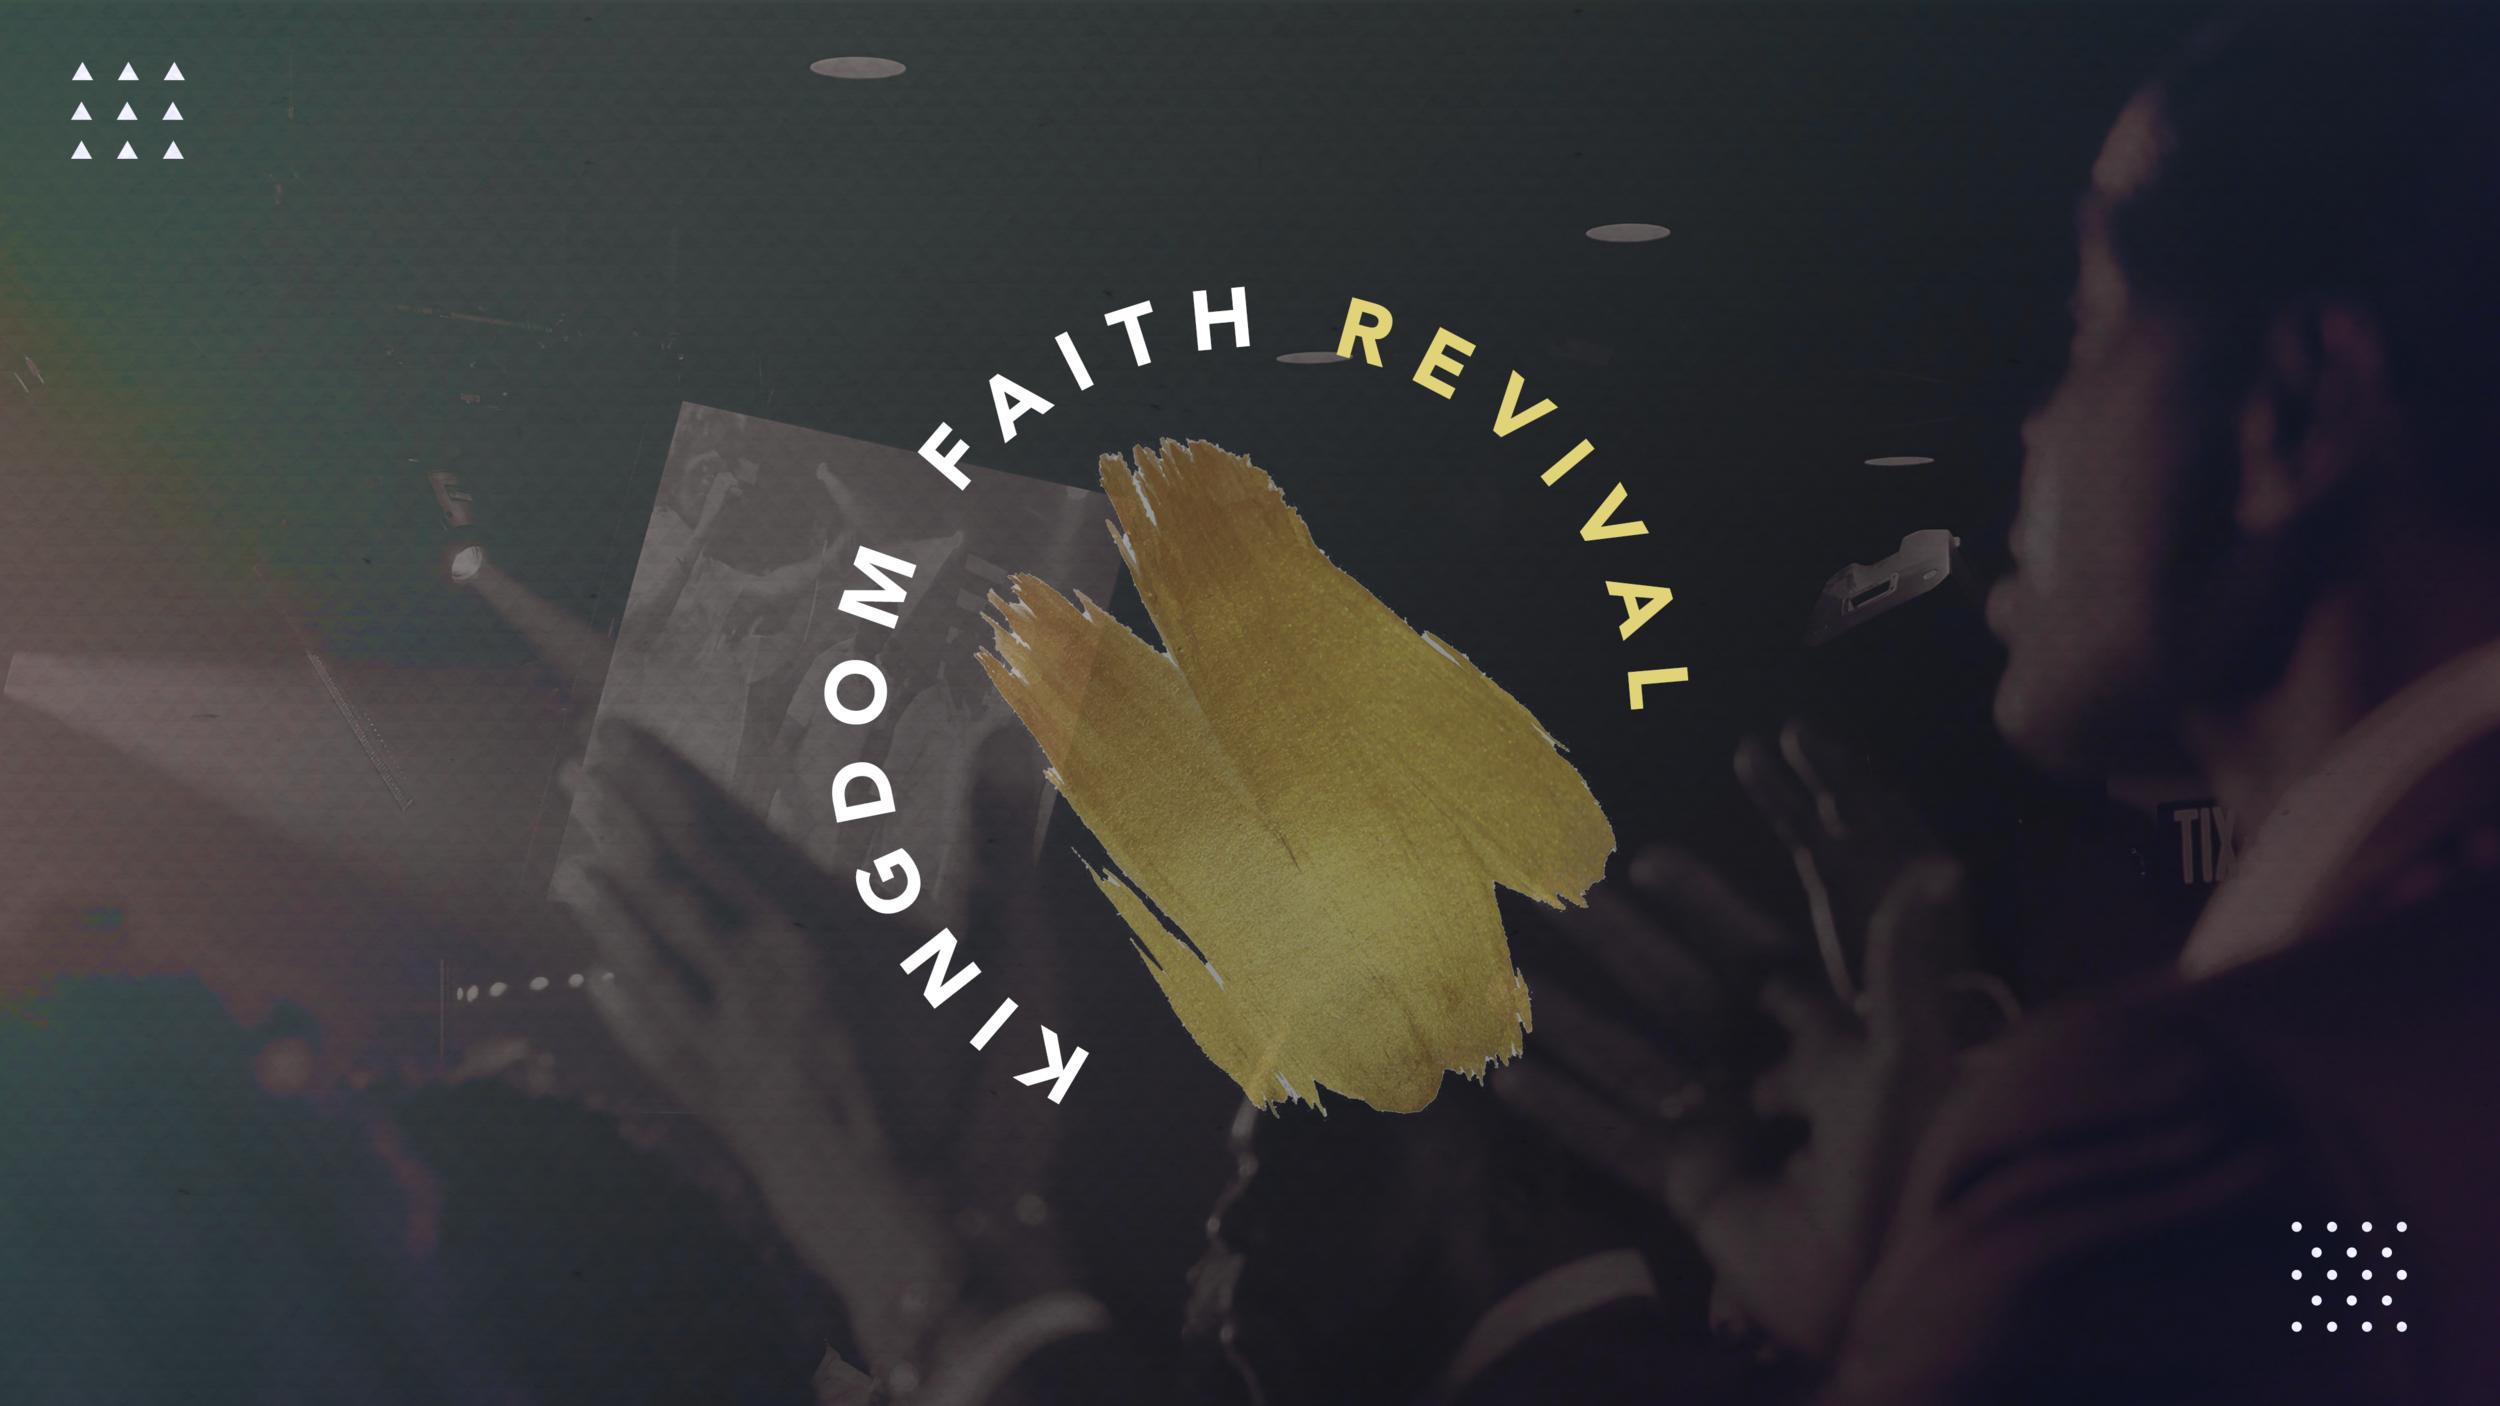 Kingdom Faith Revival 1920 x 1080.png